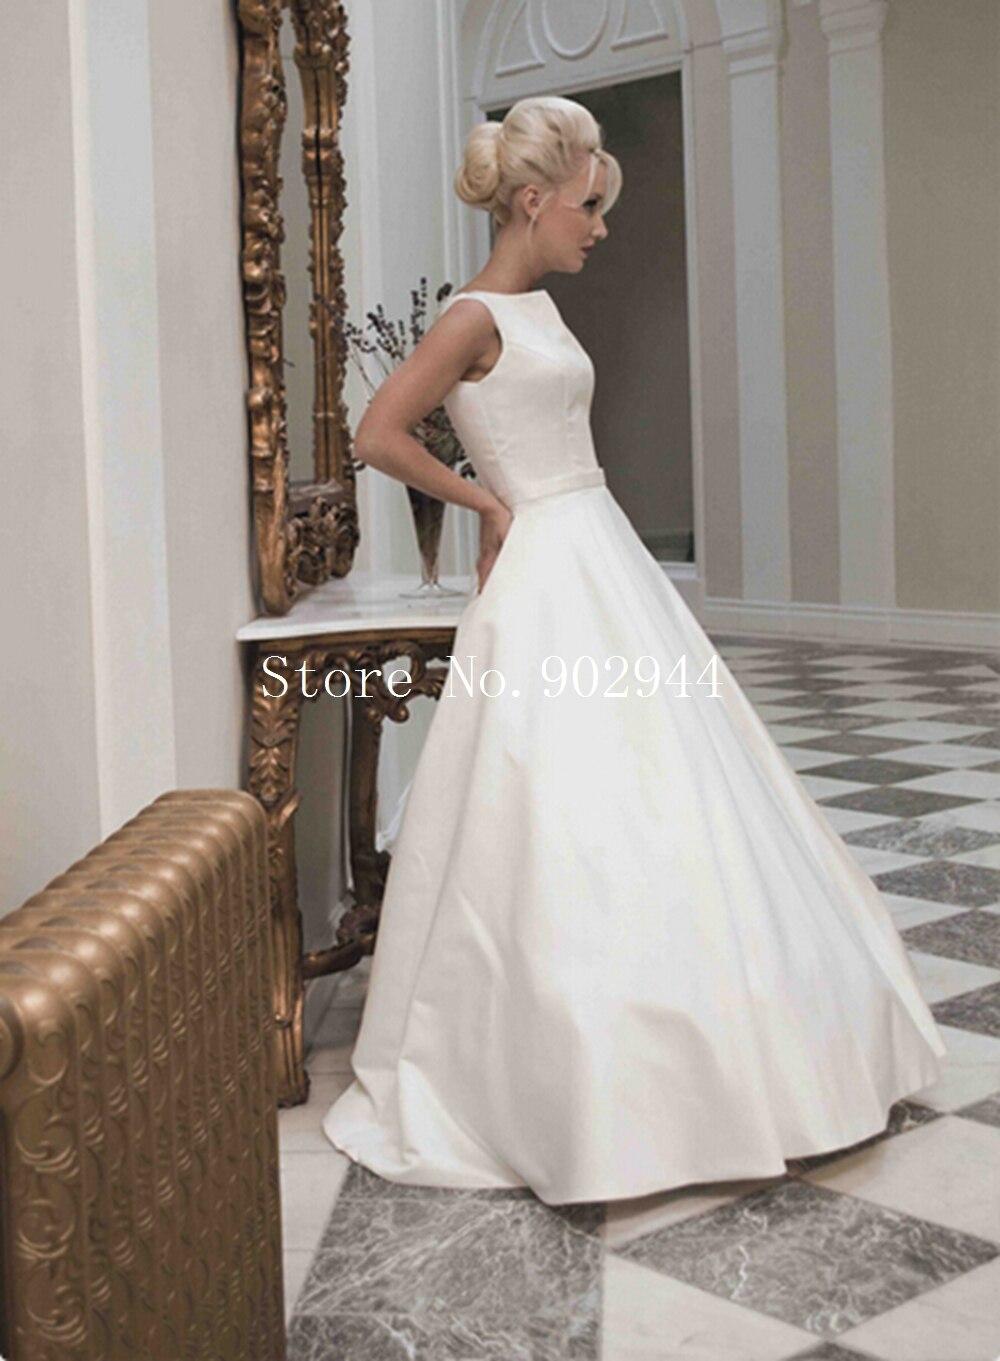 Perfect Made To Measure Wedding Dresses Photos - Wedding Dress Ideas ...